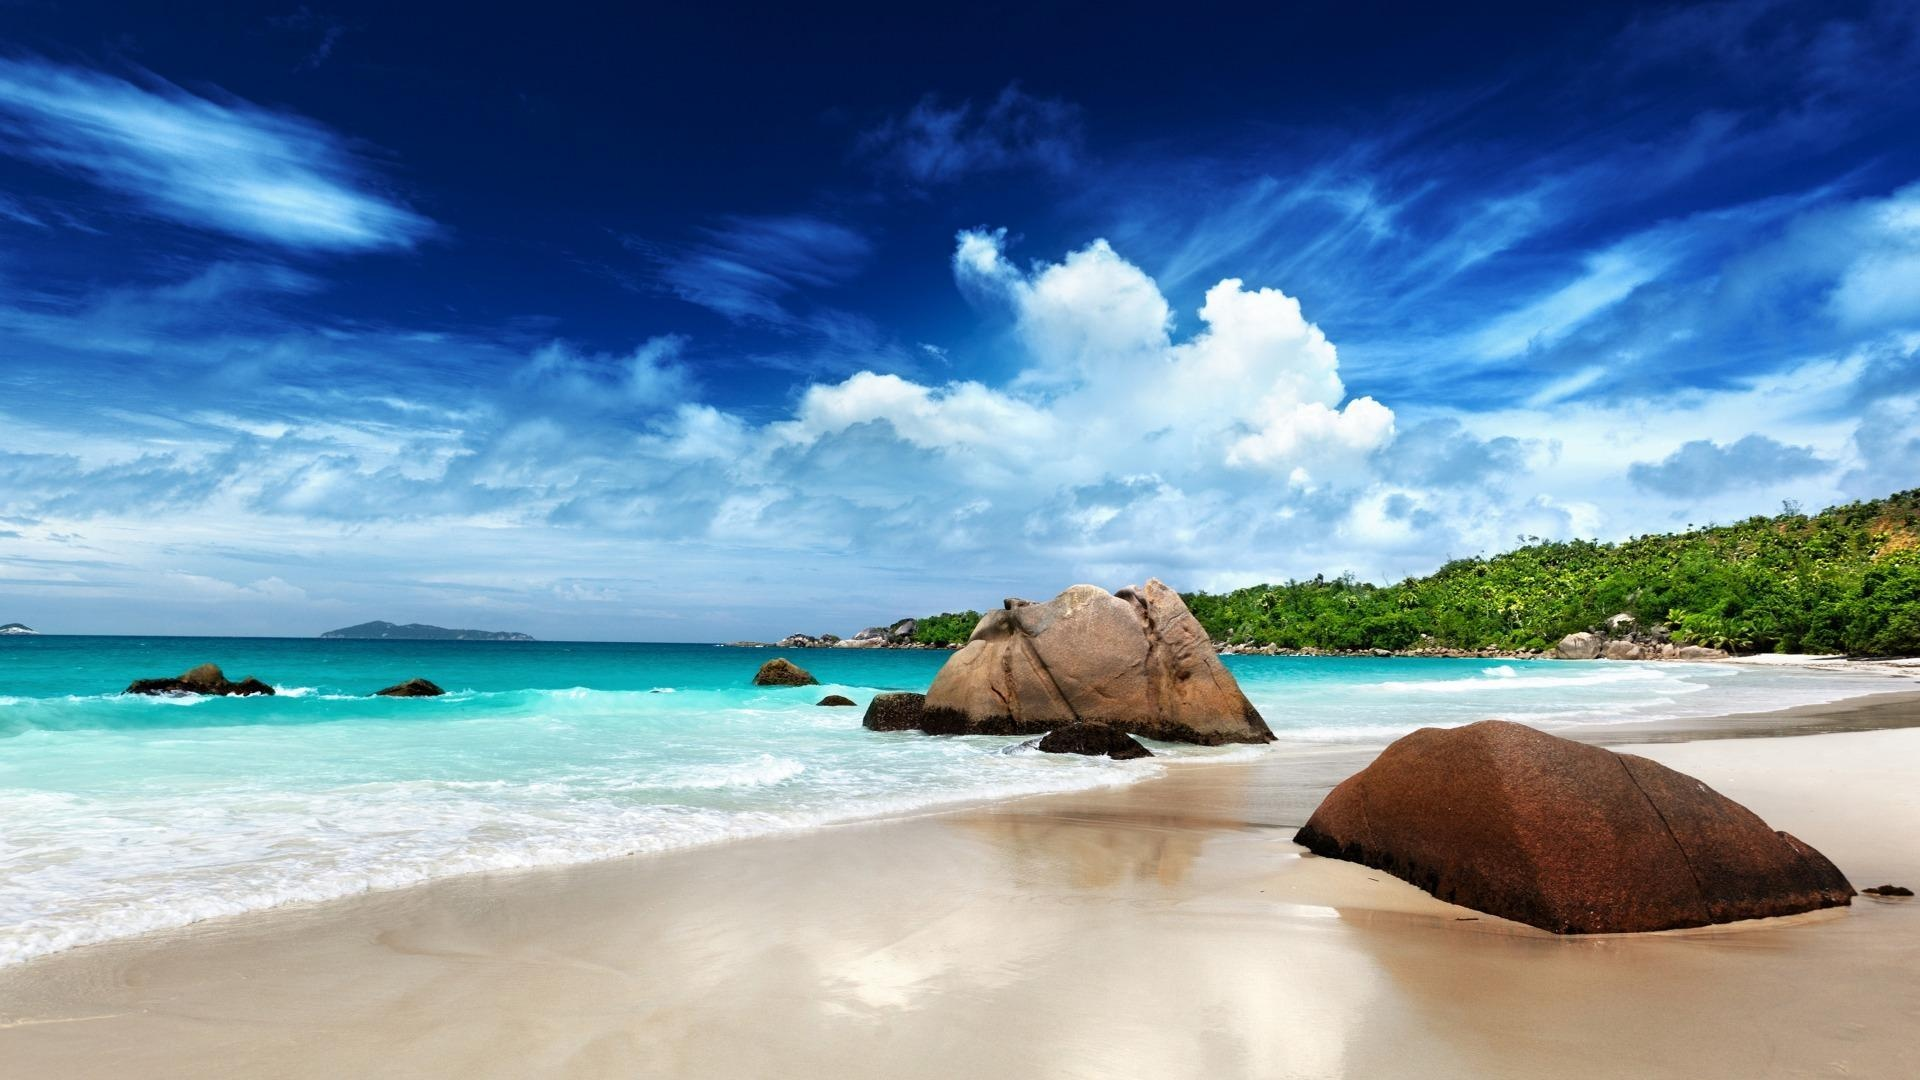 Beach best picture